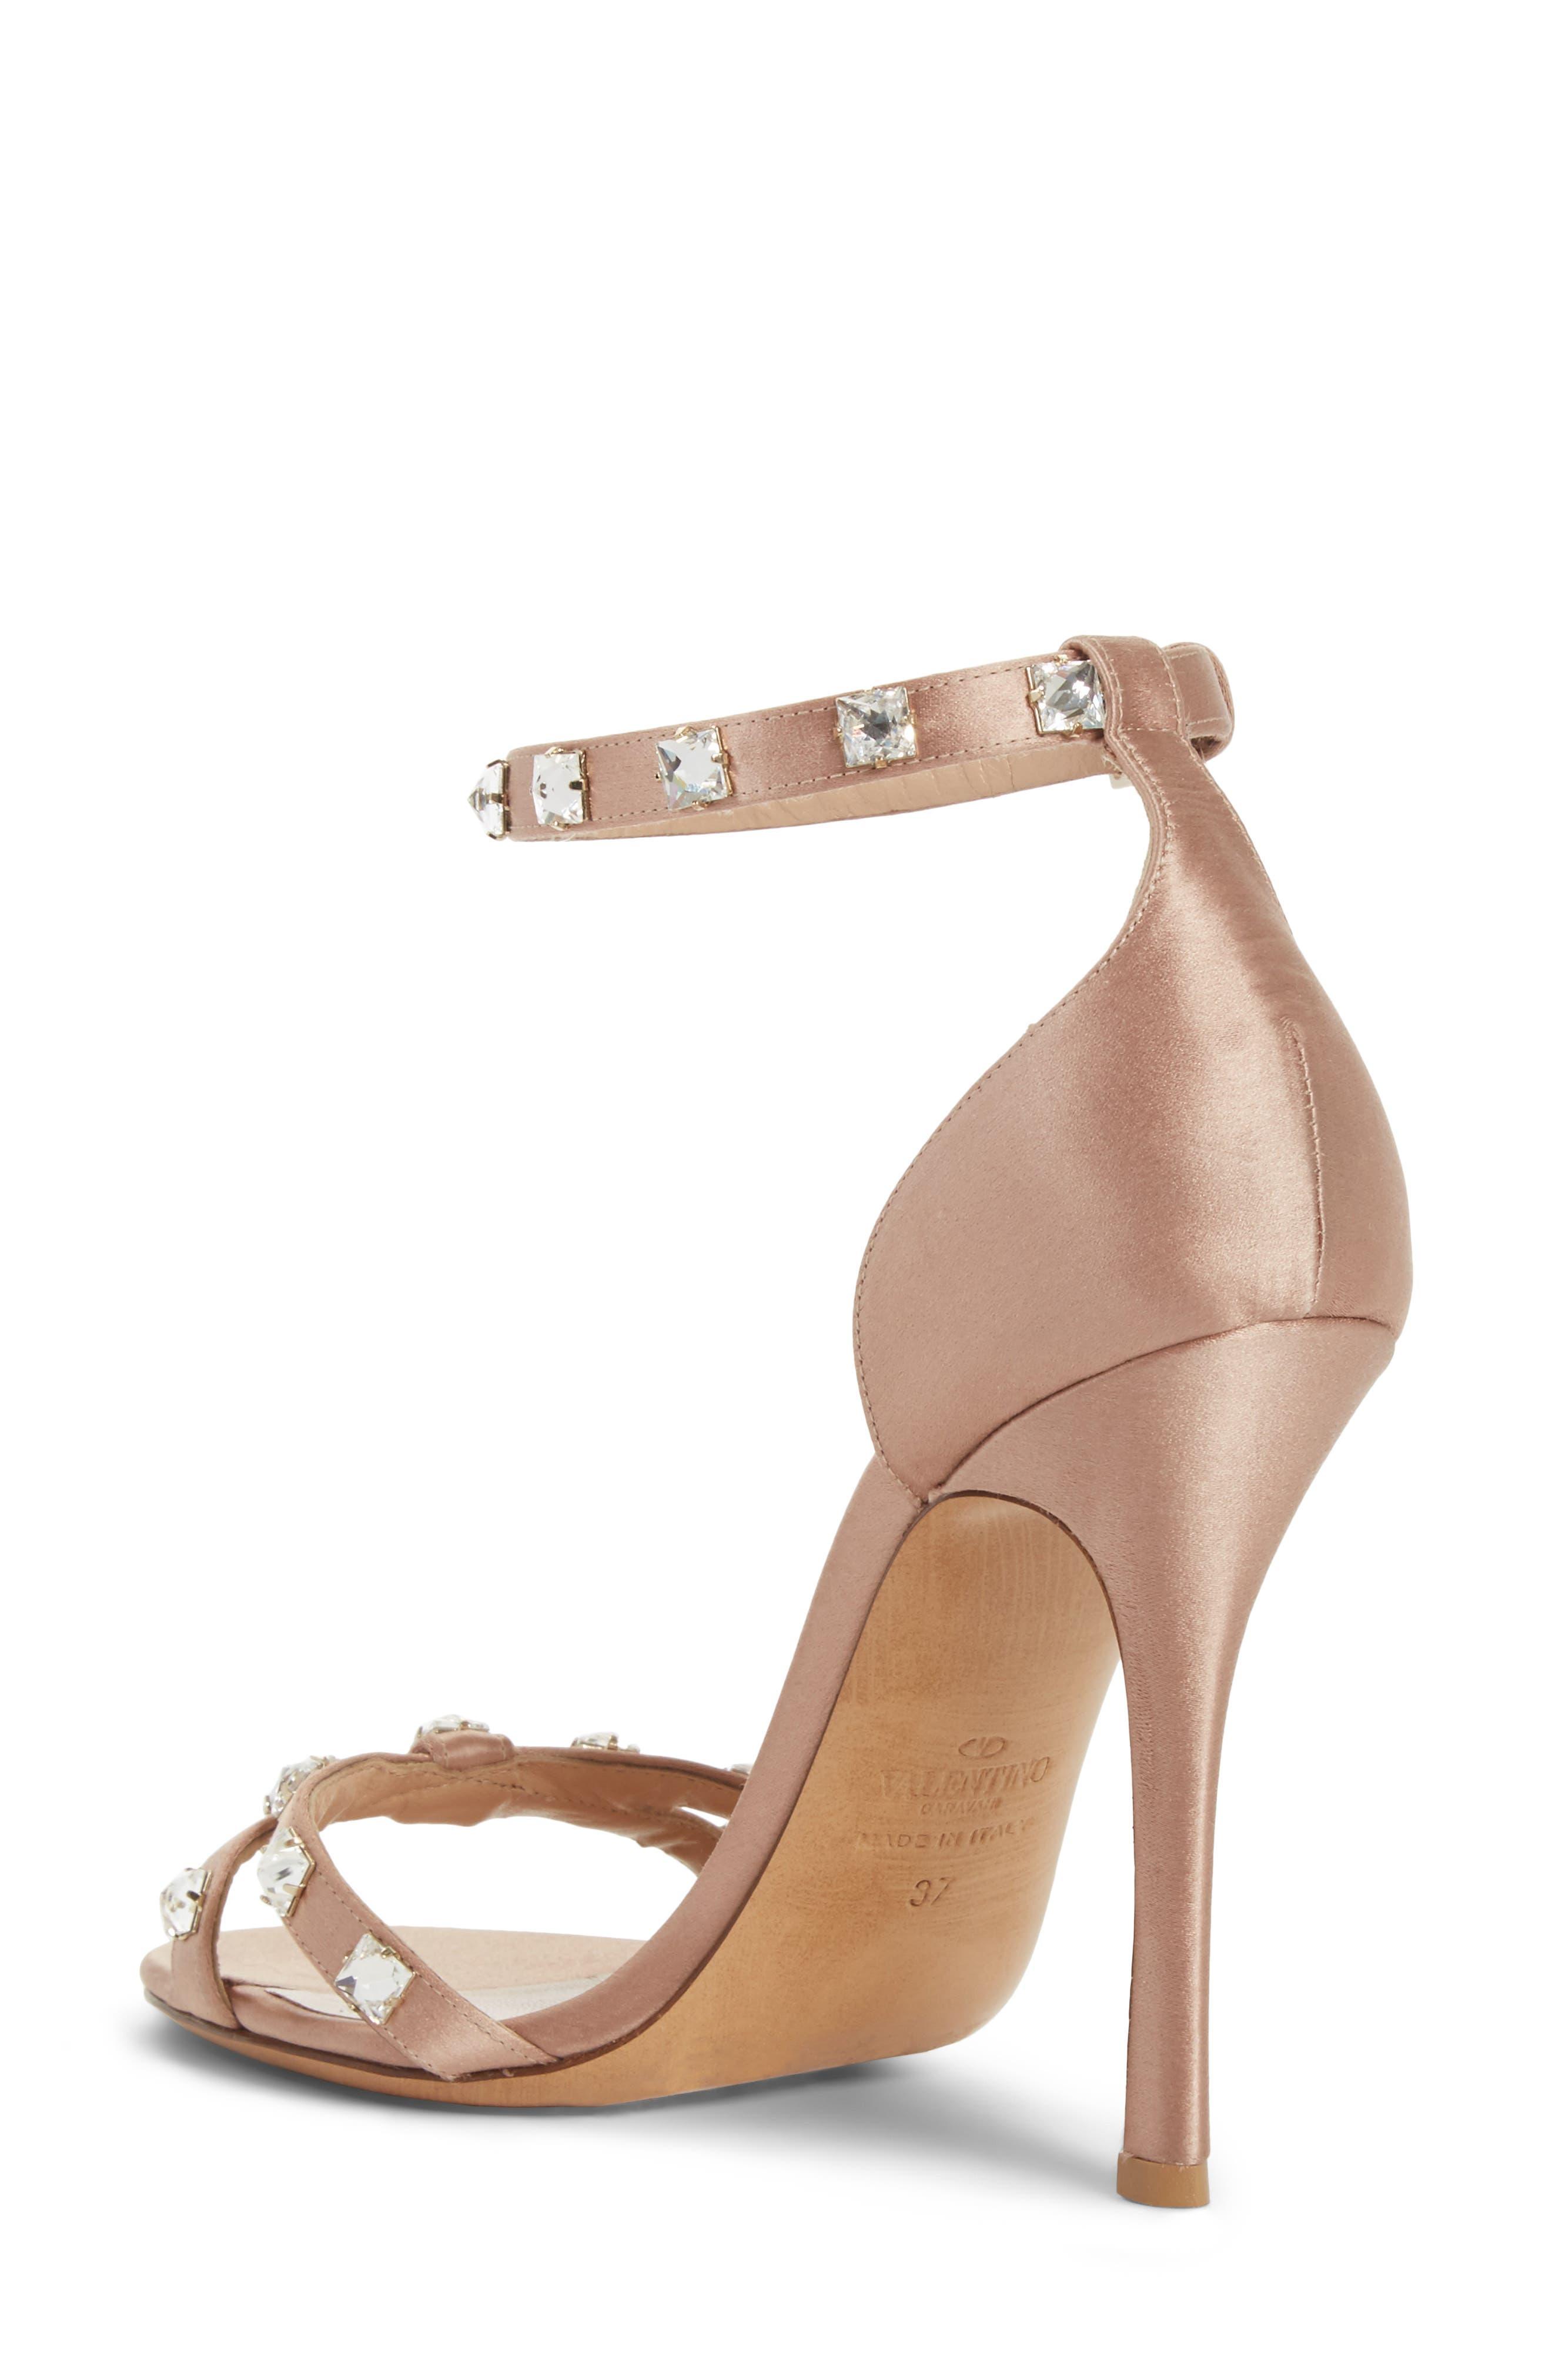 Rockstud Glam Ankle Strap Sandal,                             Alternate thumbnail 2, color,                             250